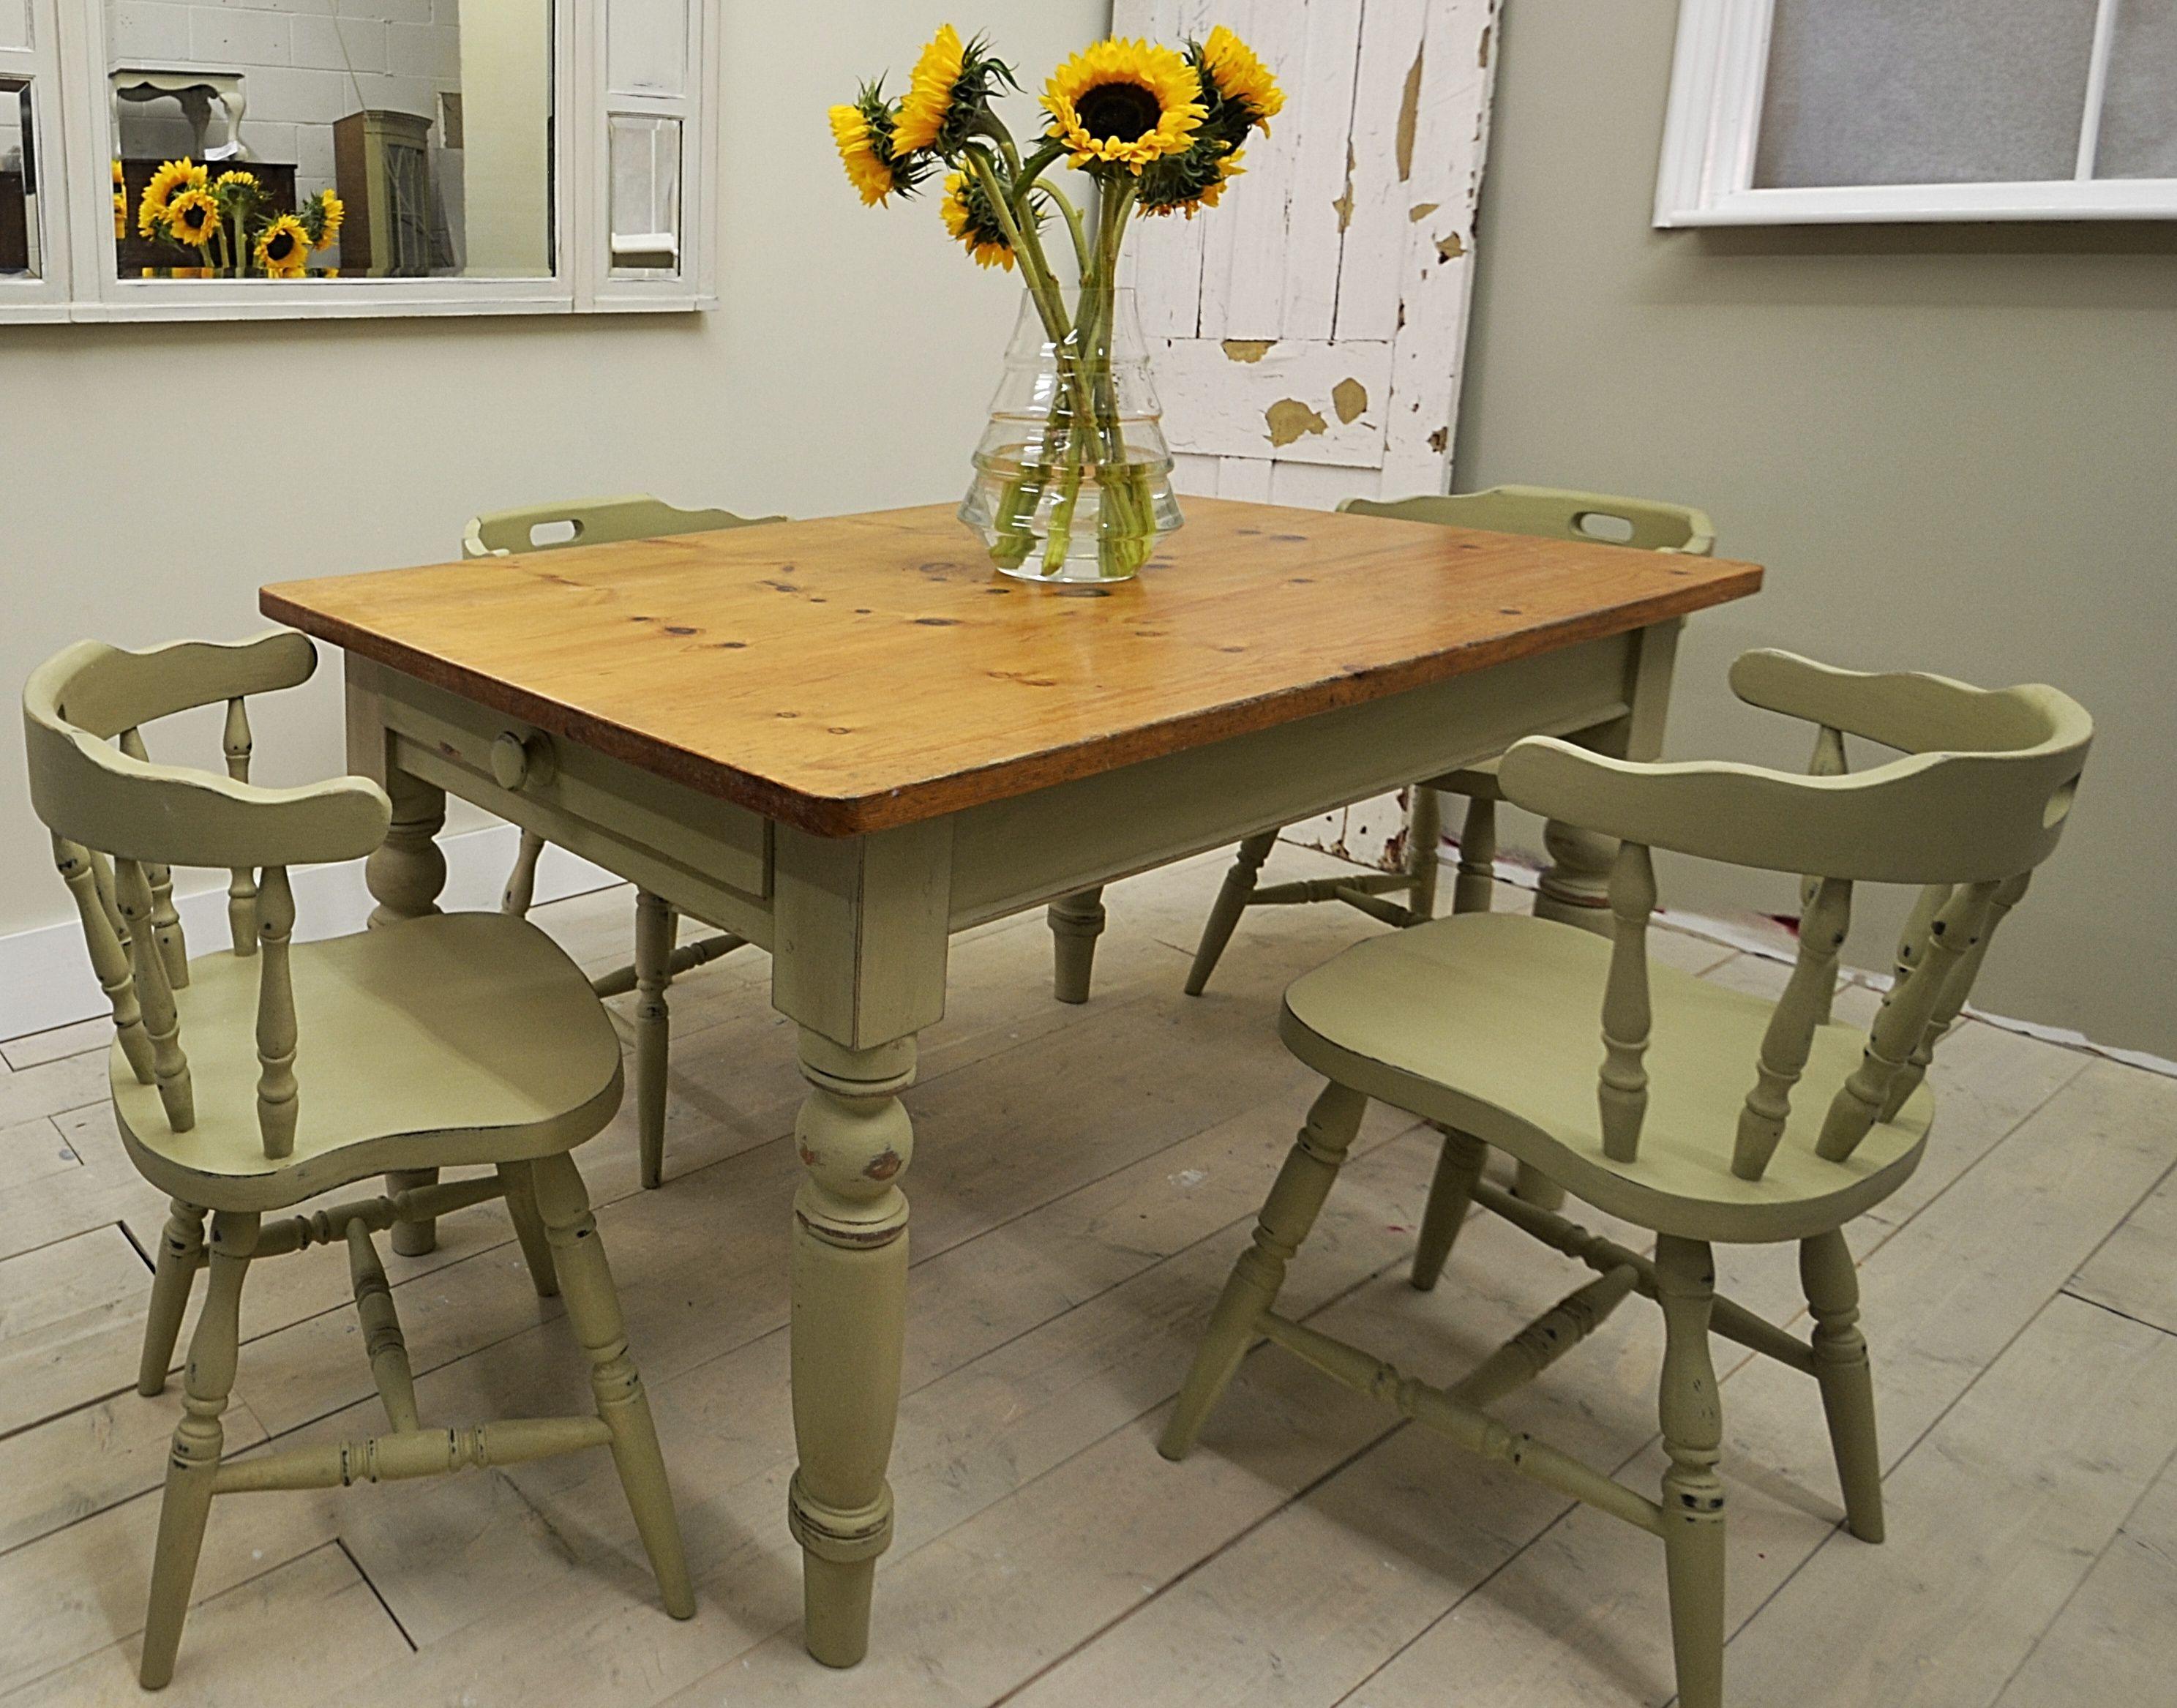 Farmhouse Dining Table & Captain's Chairs Shabby chic